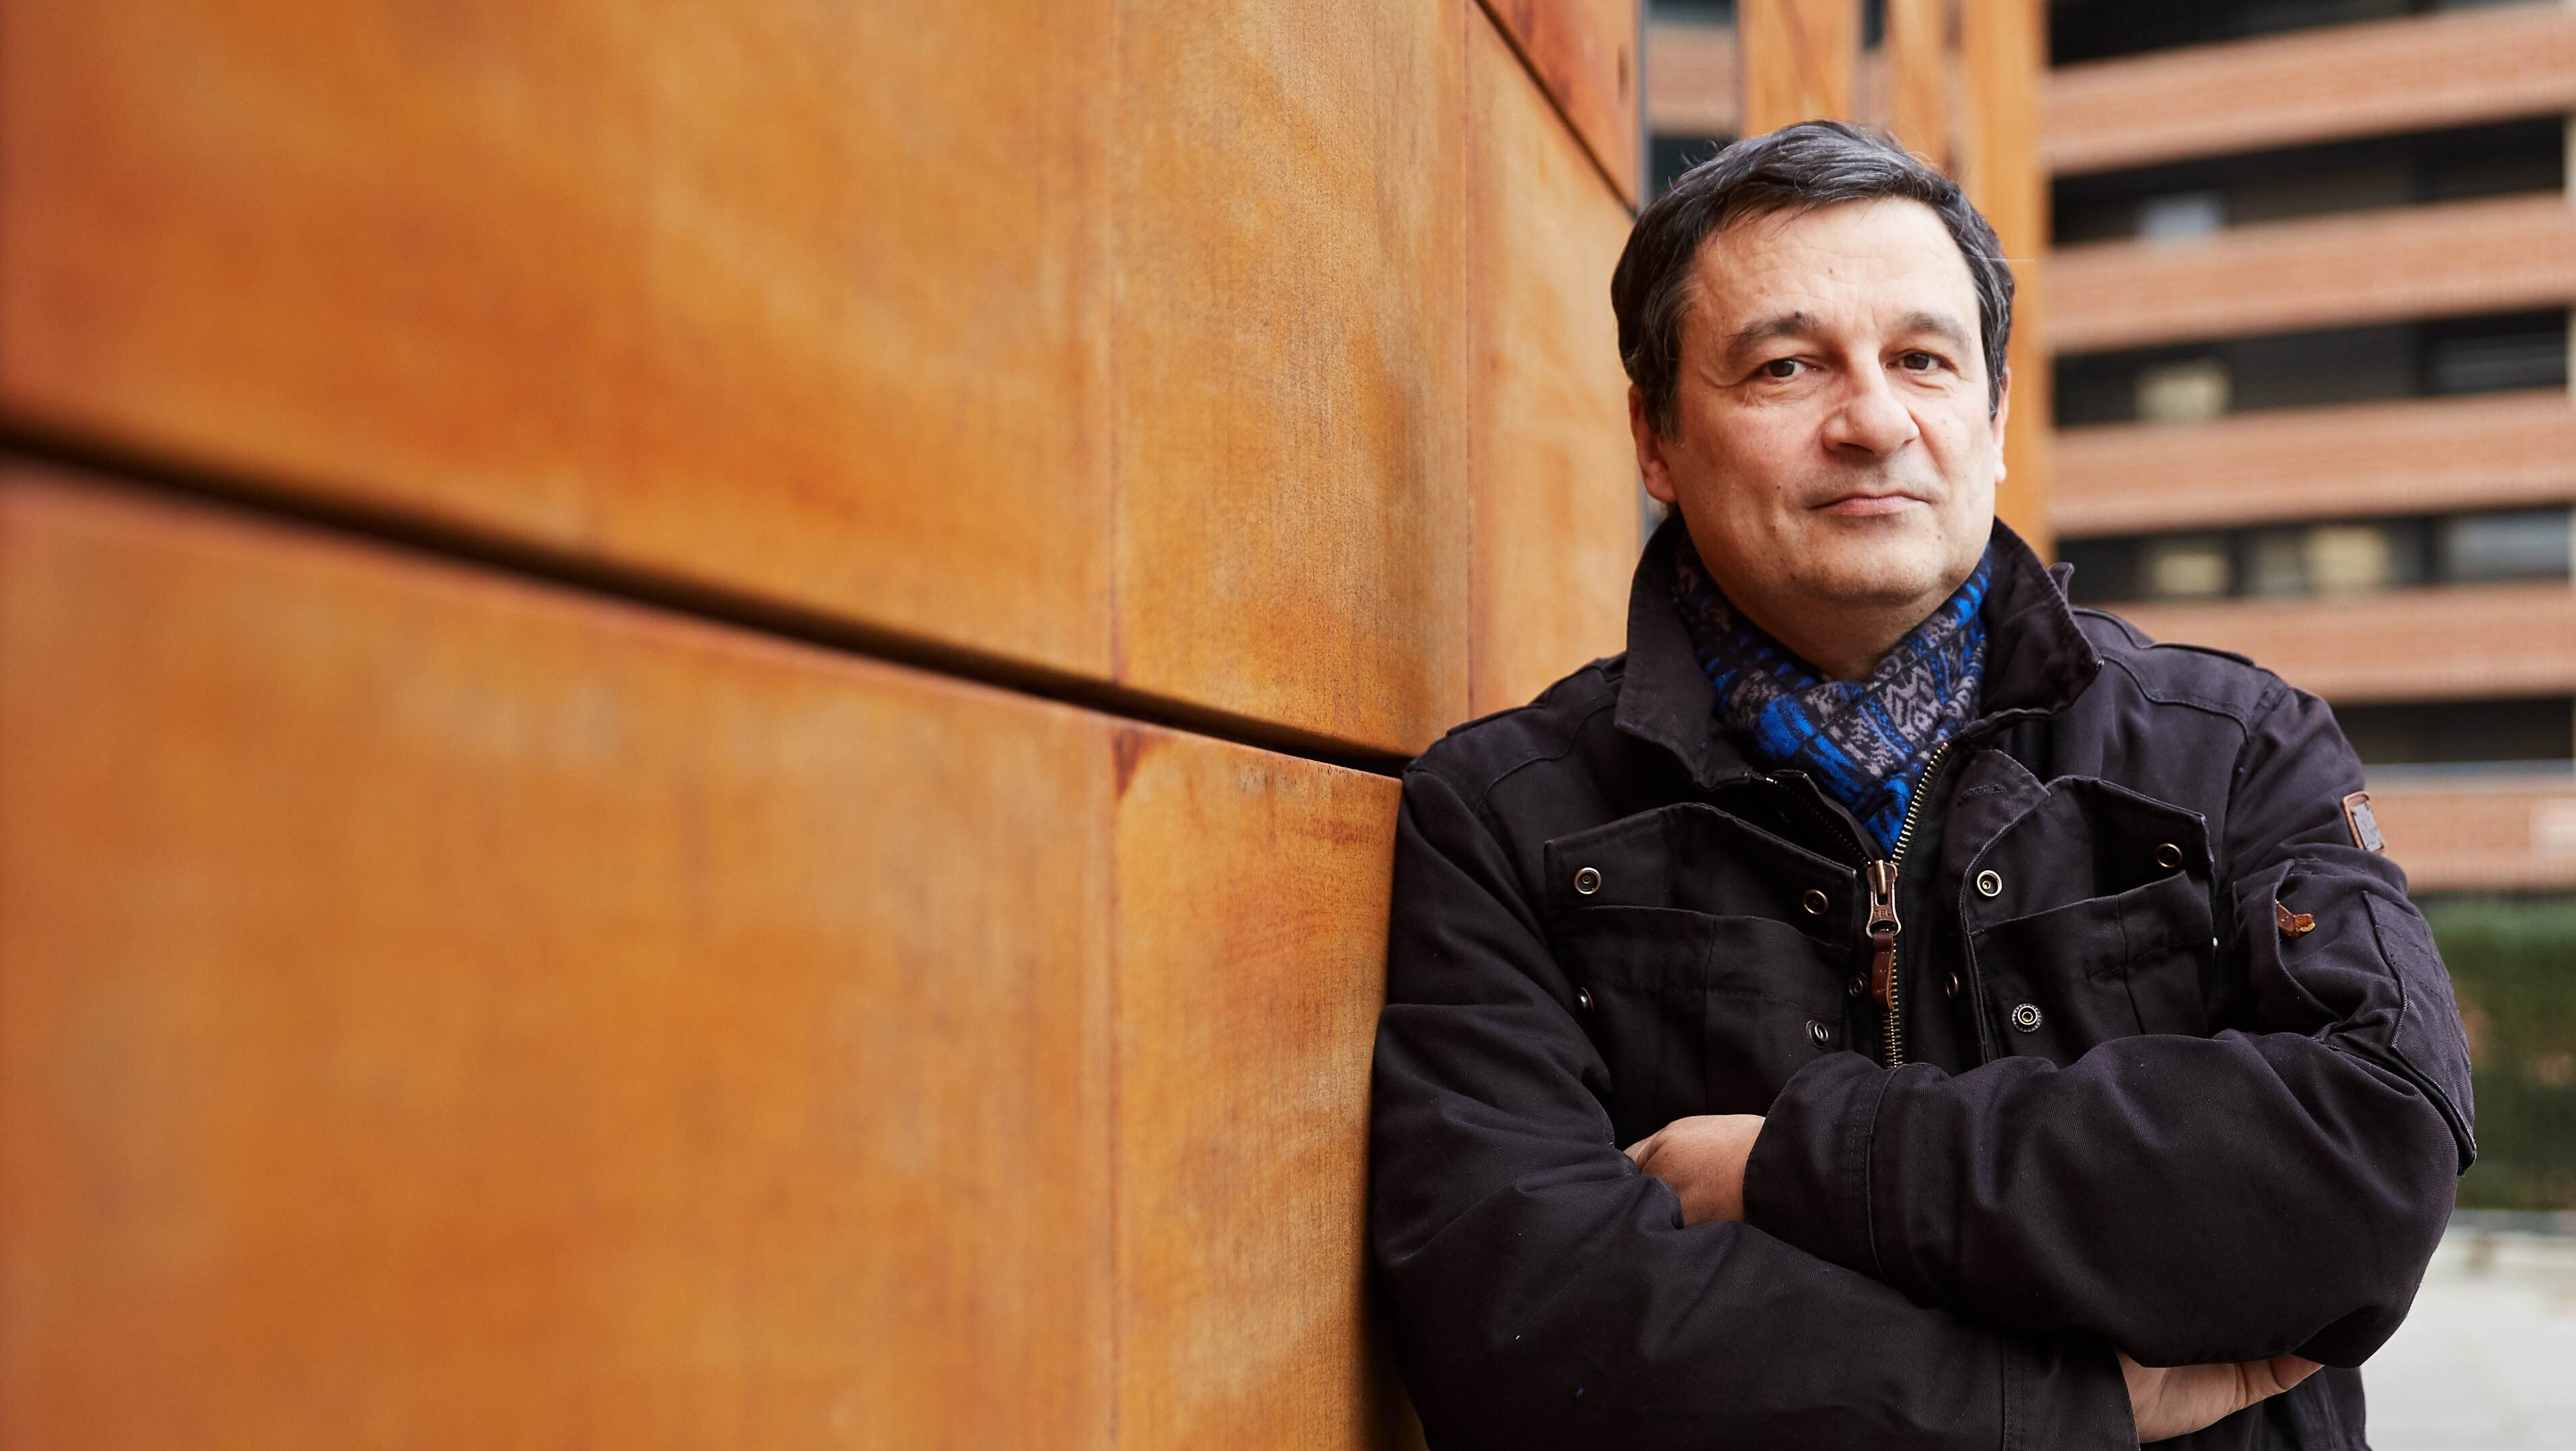 DarioBressanini intervista